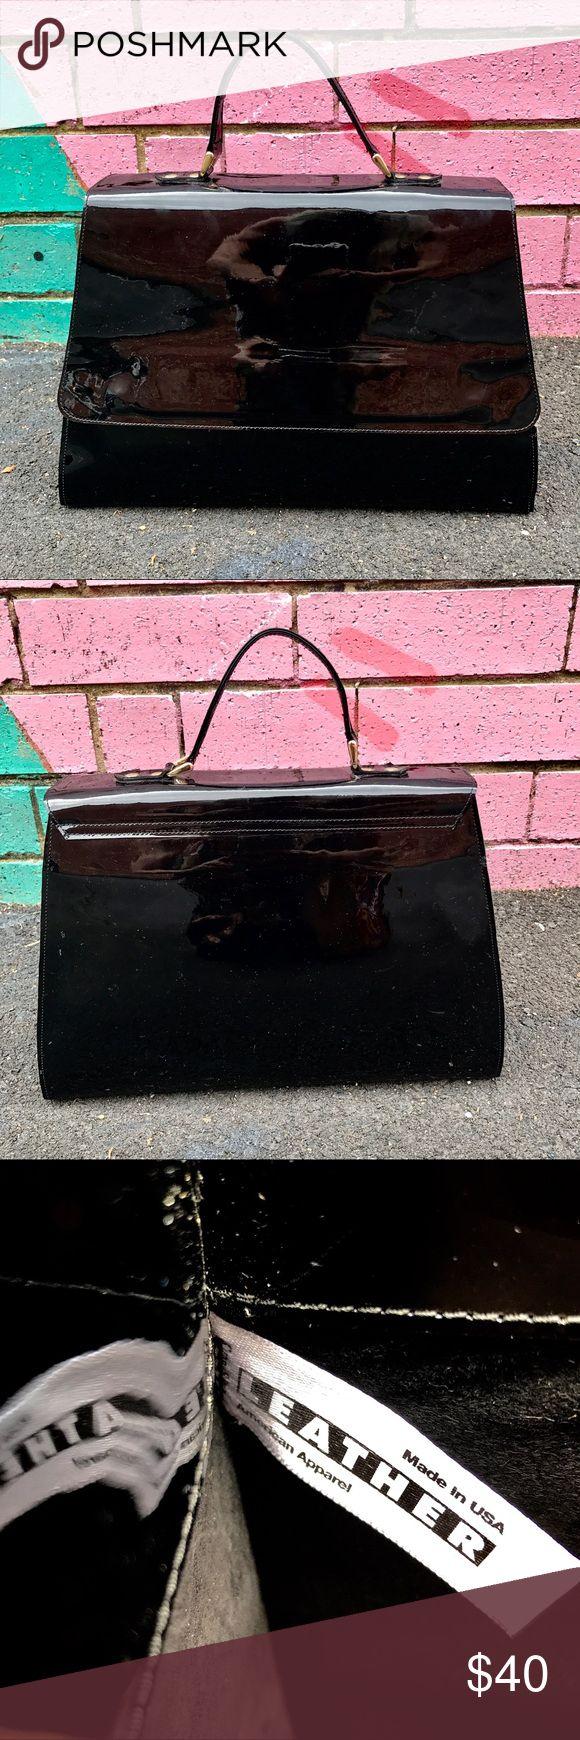 American Apparel Leather Handbag Brand new never used Spring x American Apparel patent leather handbag. Such a statement piece! American Apparel Bags